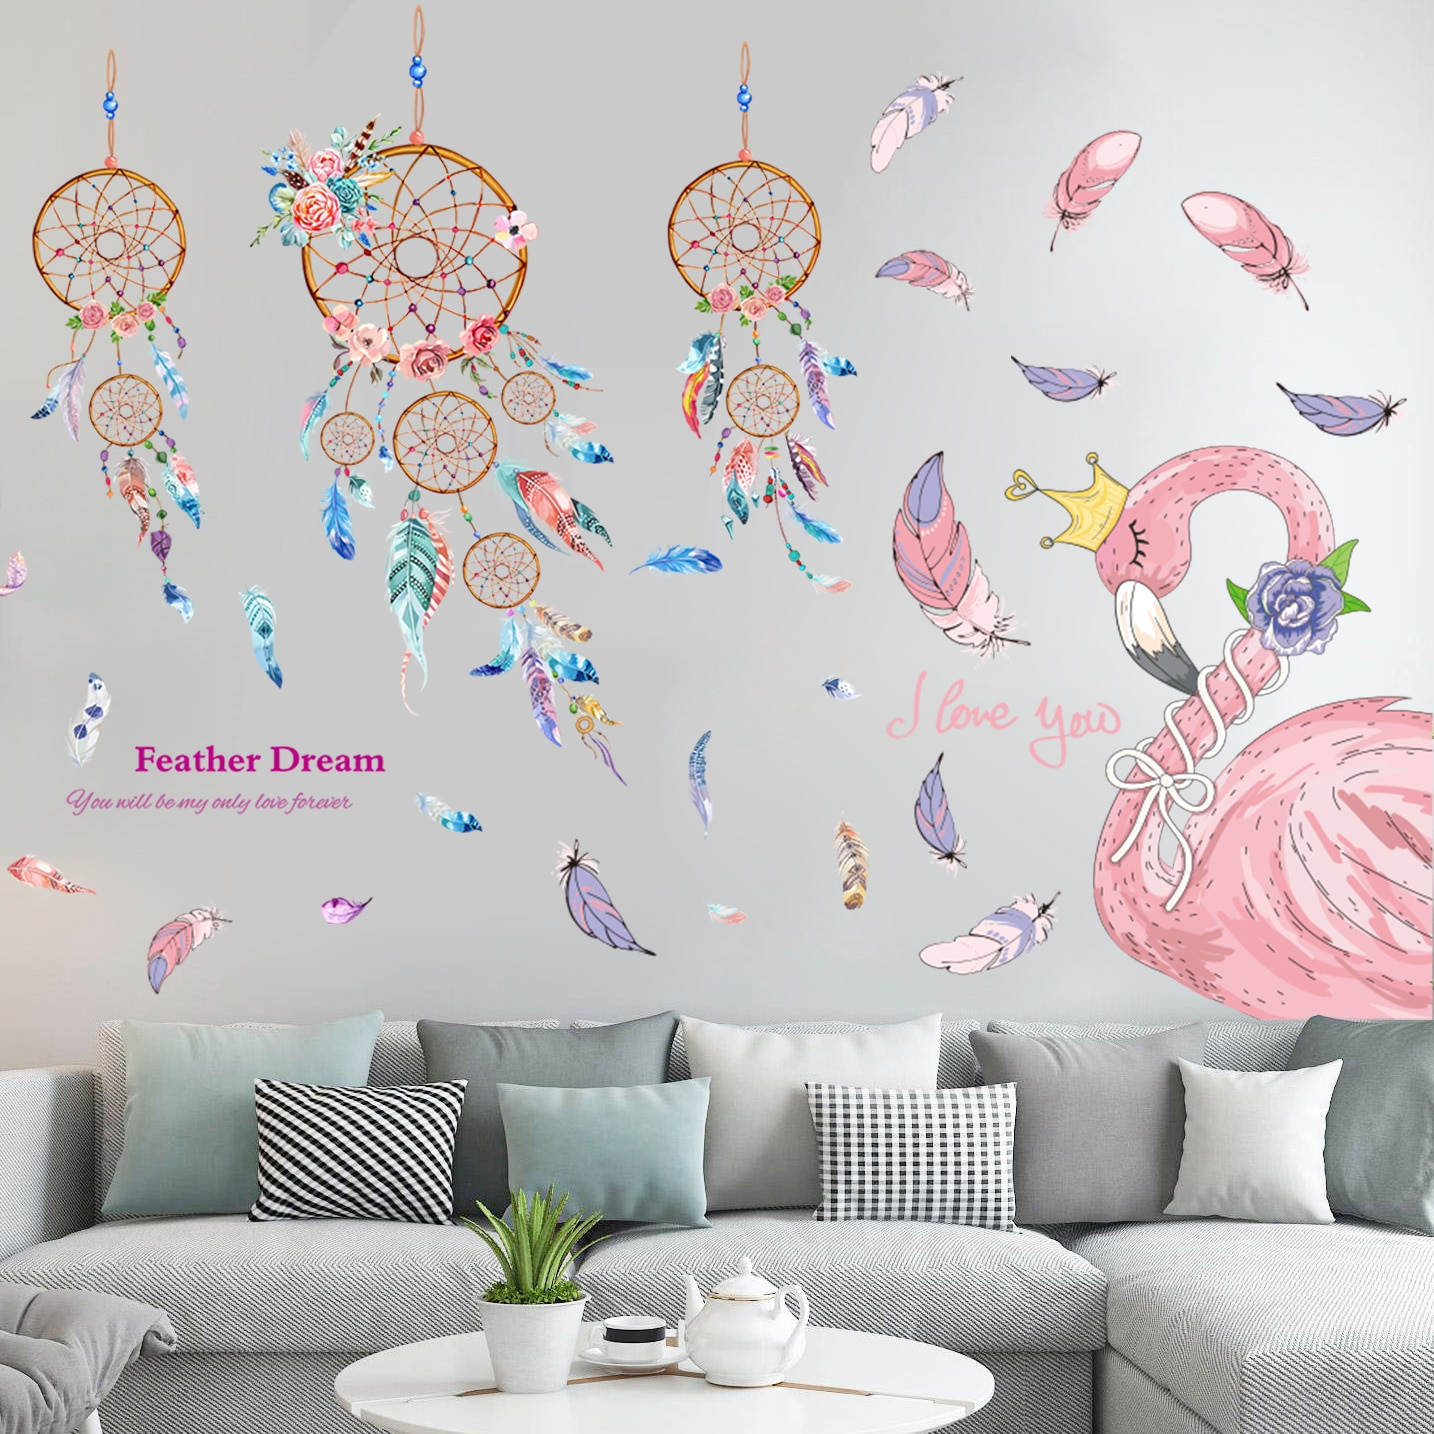 [Shijuekongjian] Dreamcatcher Federn Wand Aufkleber DIY Flamingo Tier Wandbild Decals für Haus Kinderzimmer Baby BedroomDecoration